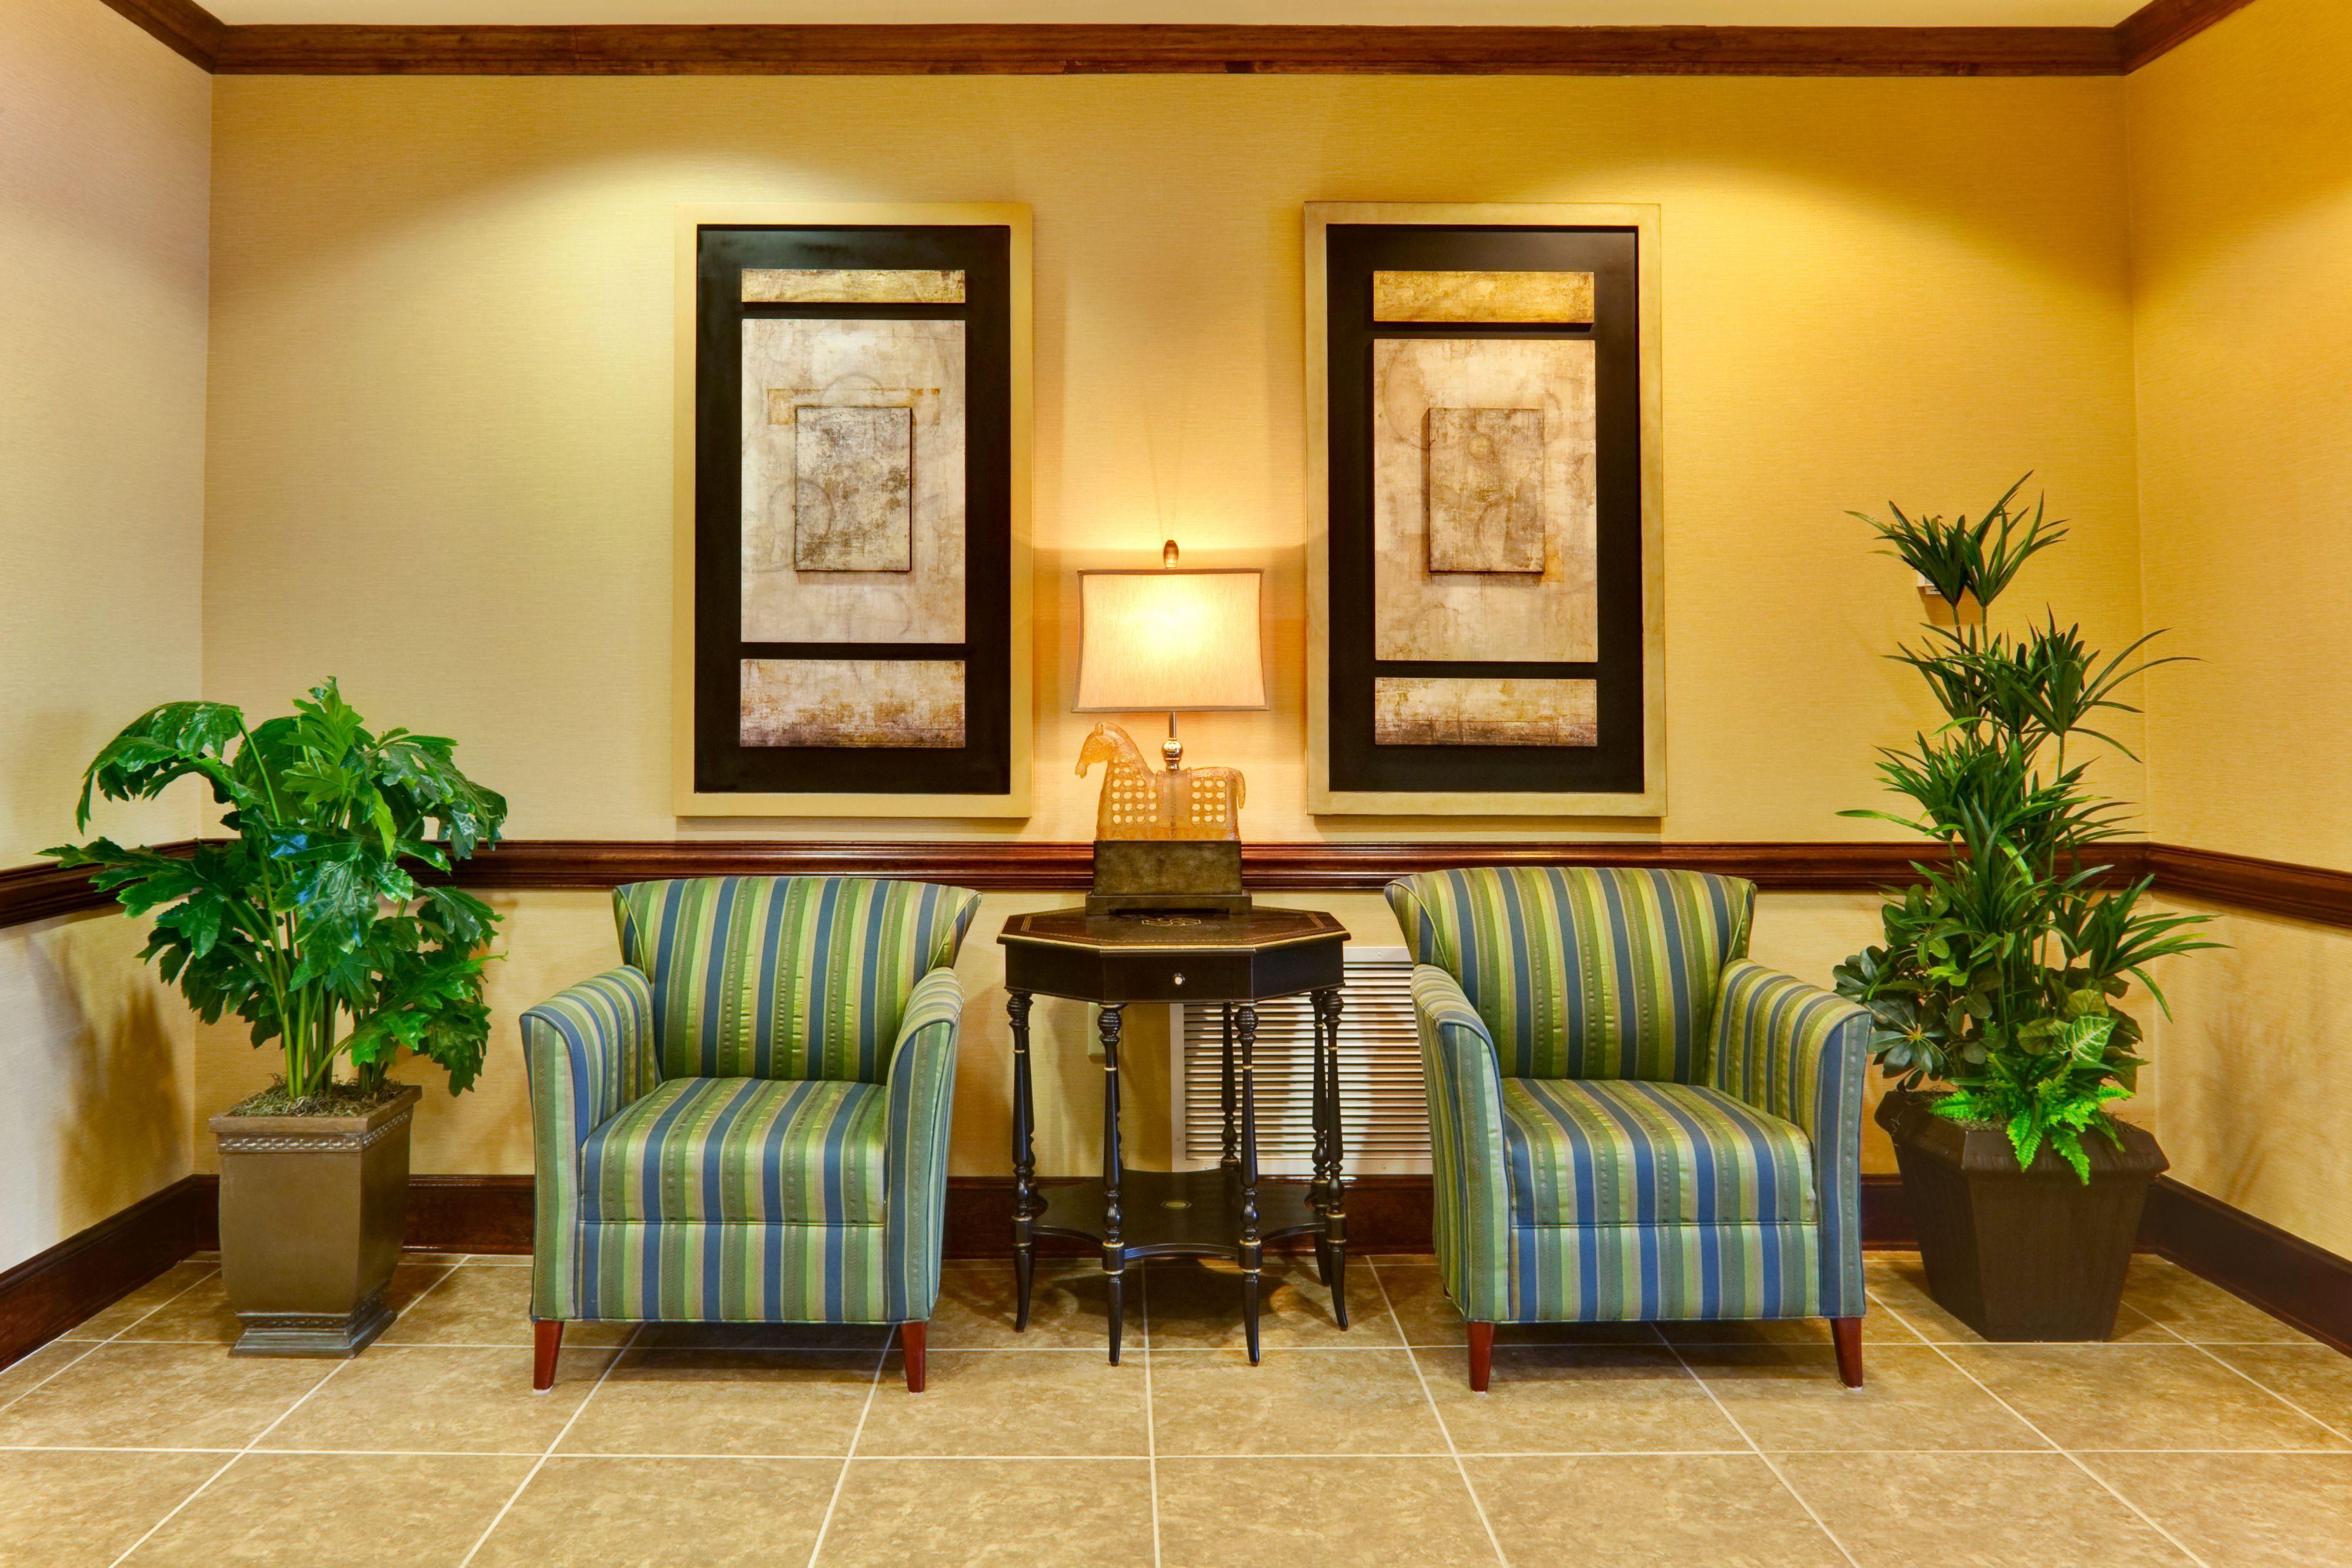 Holiday Inn Express Millington-Memphis Area image 6